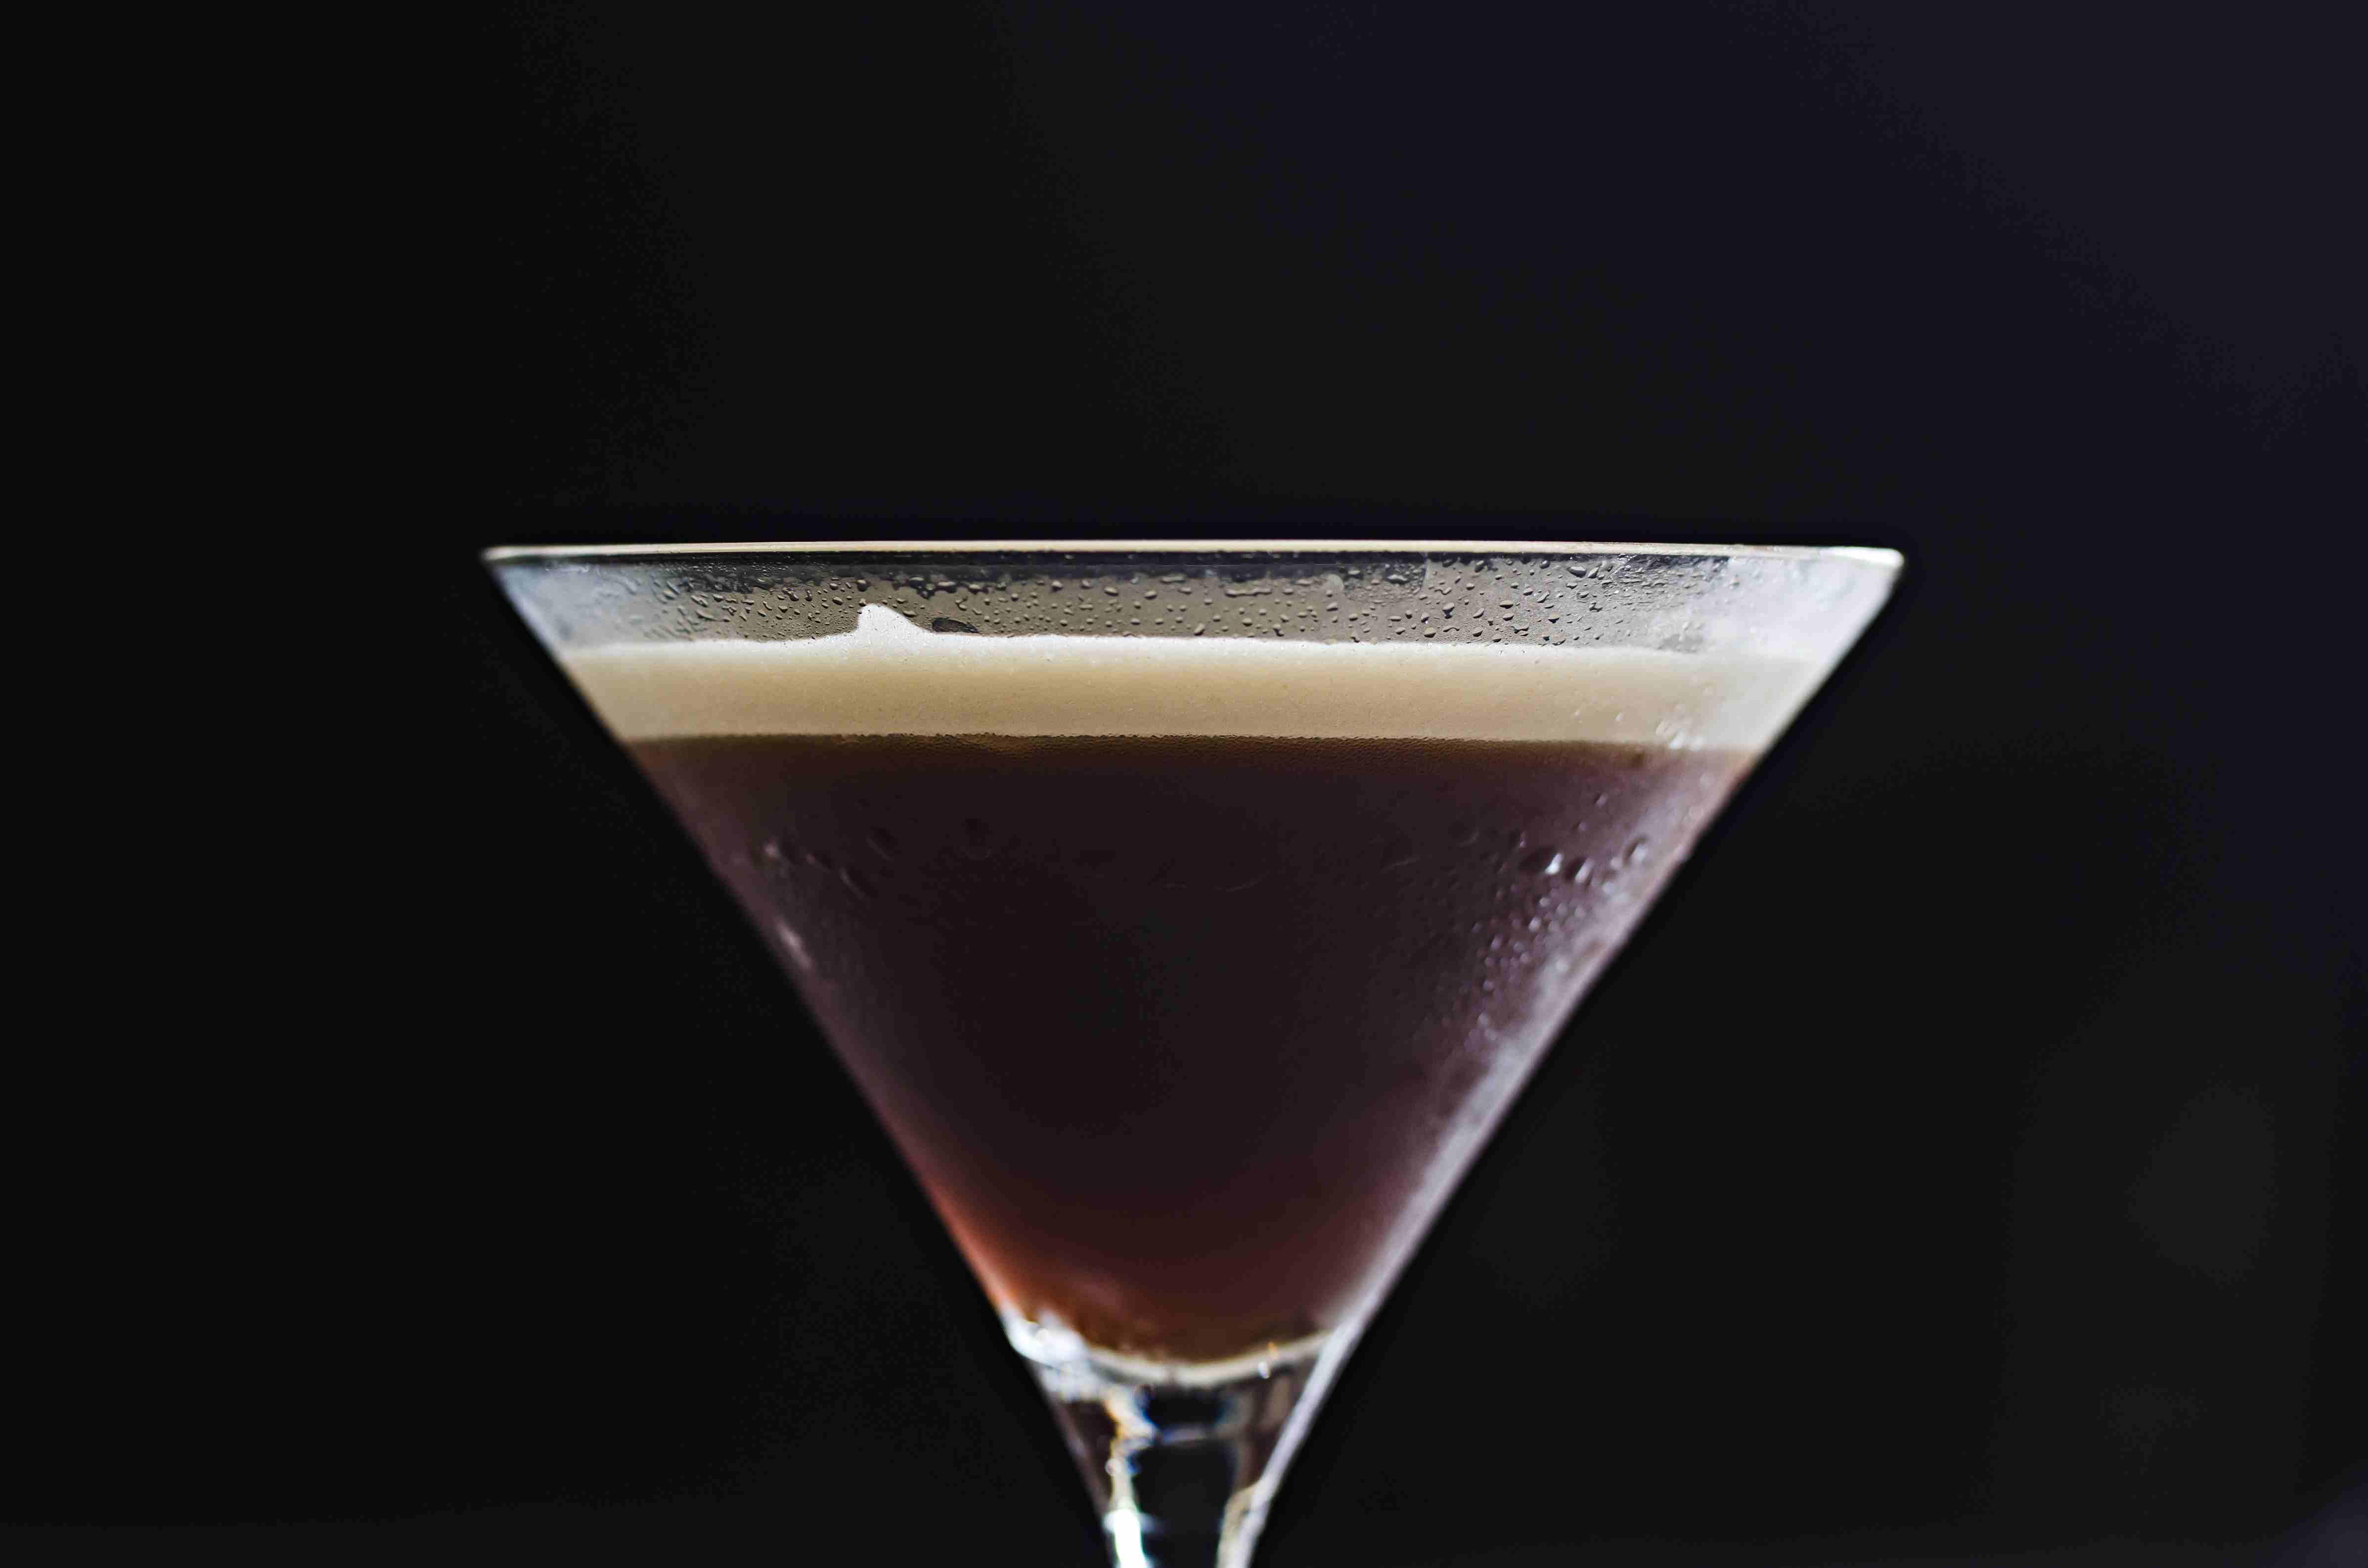 Coffee Martini on a Black Background